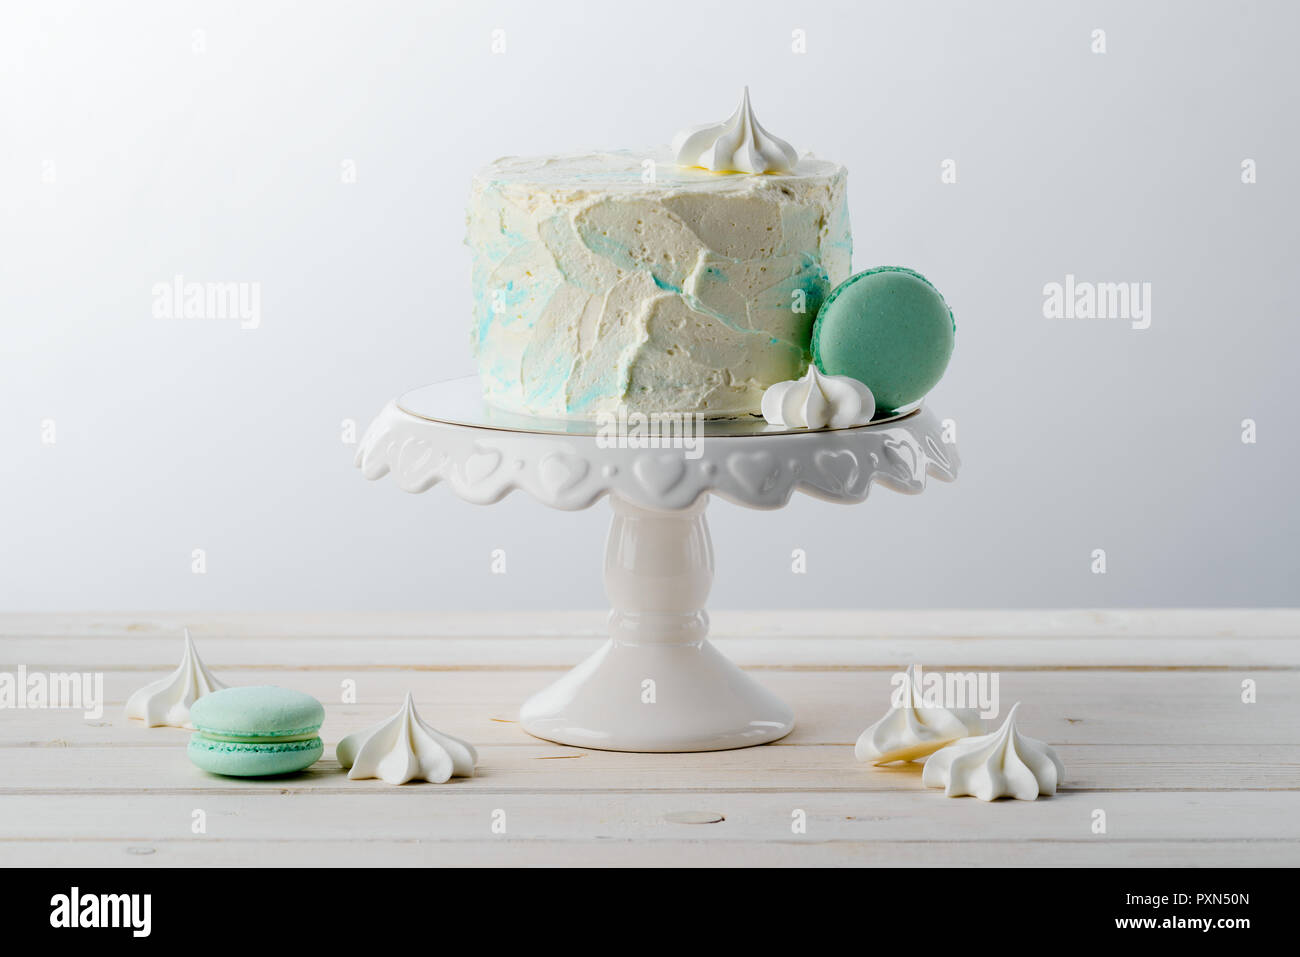 Minimalist Cake Macaroni And Meringues Stock Photo Alamy